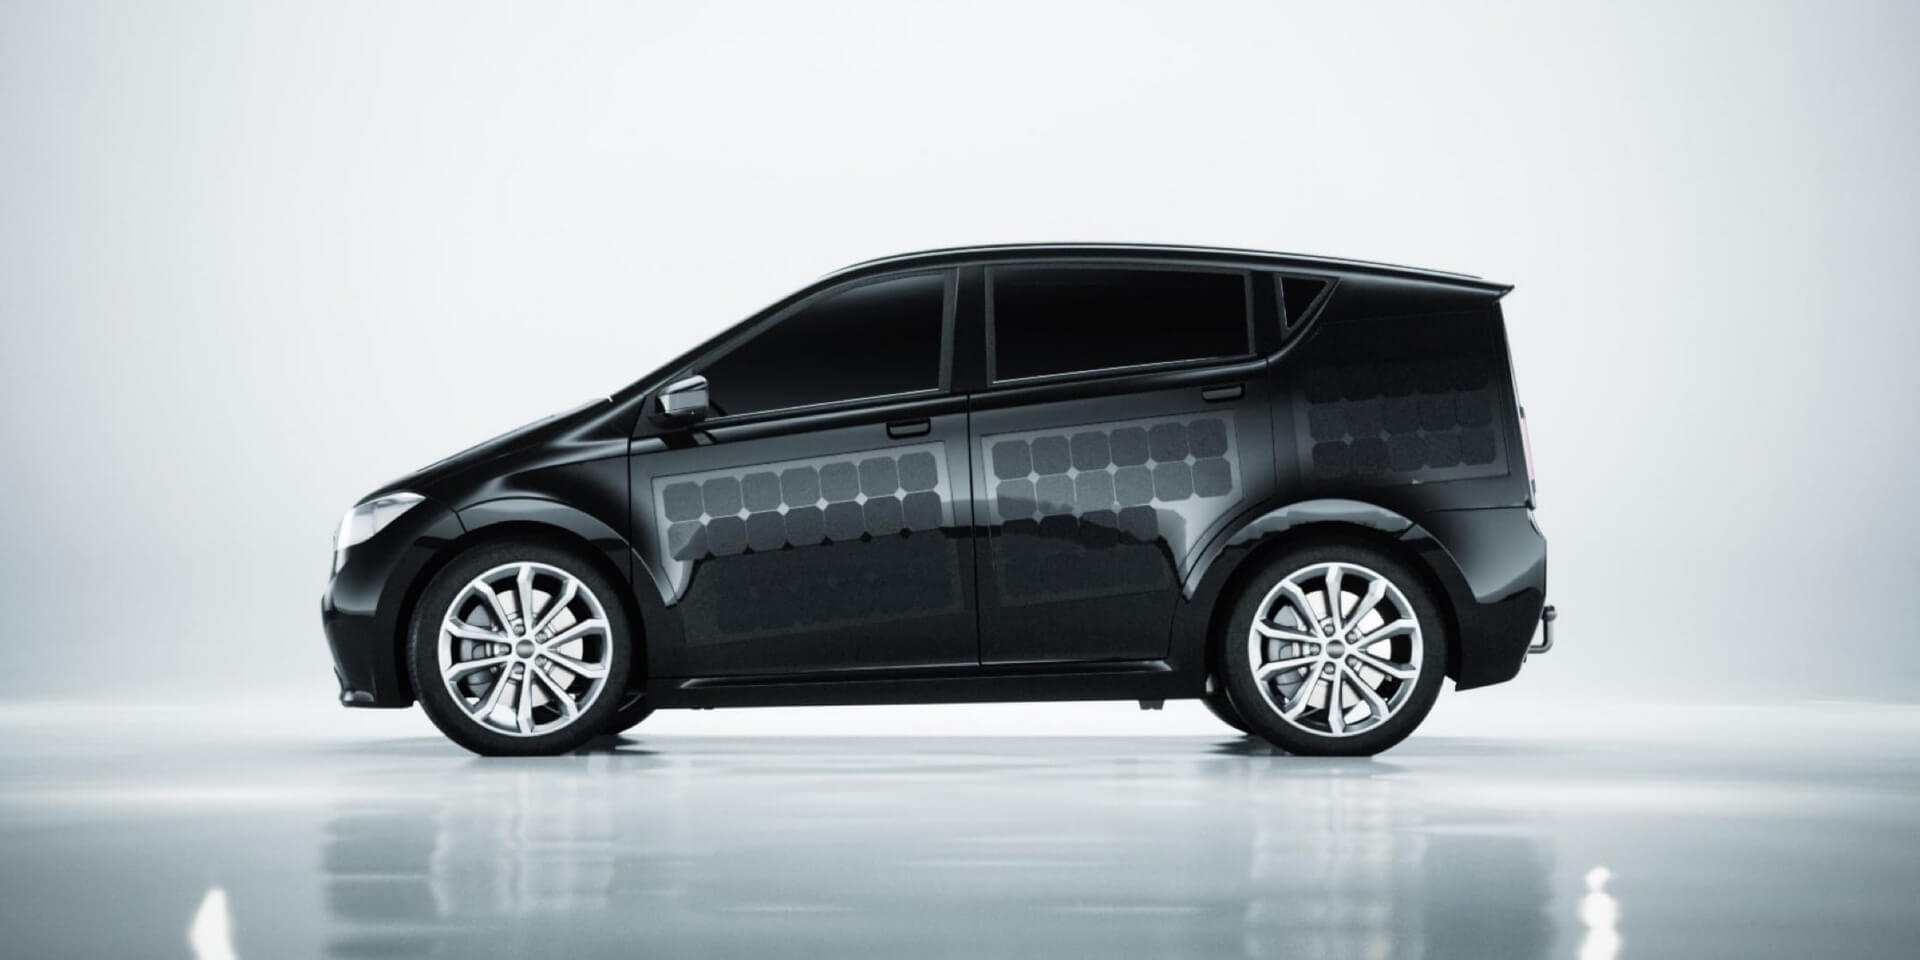 Концепт электромобиля на солнечных панелях Sion